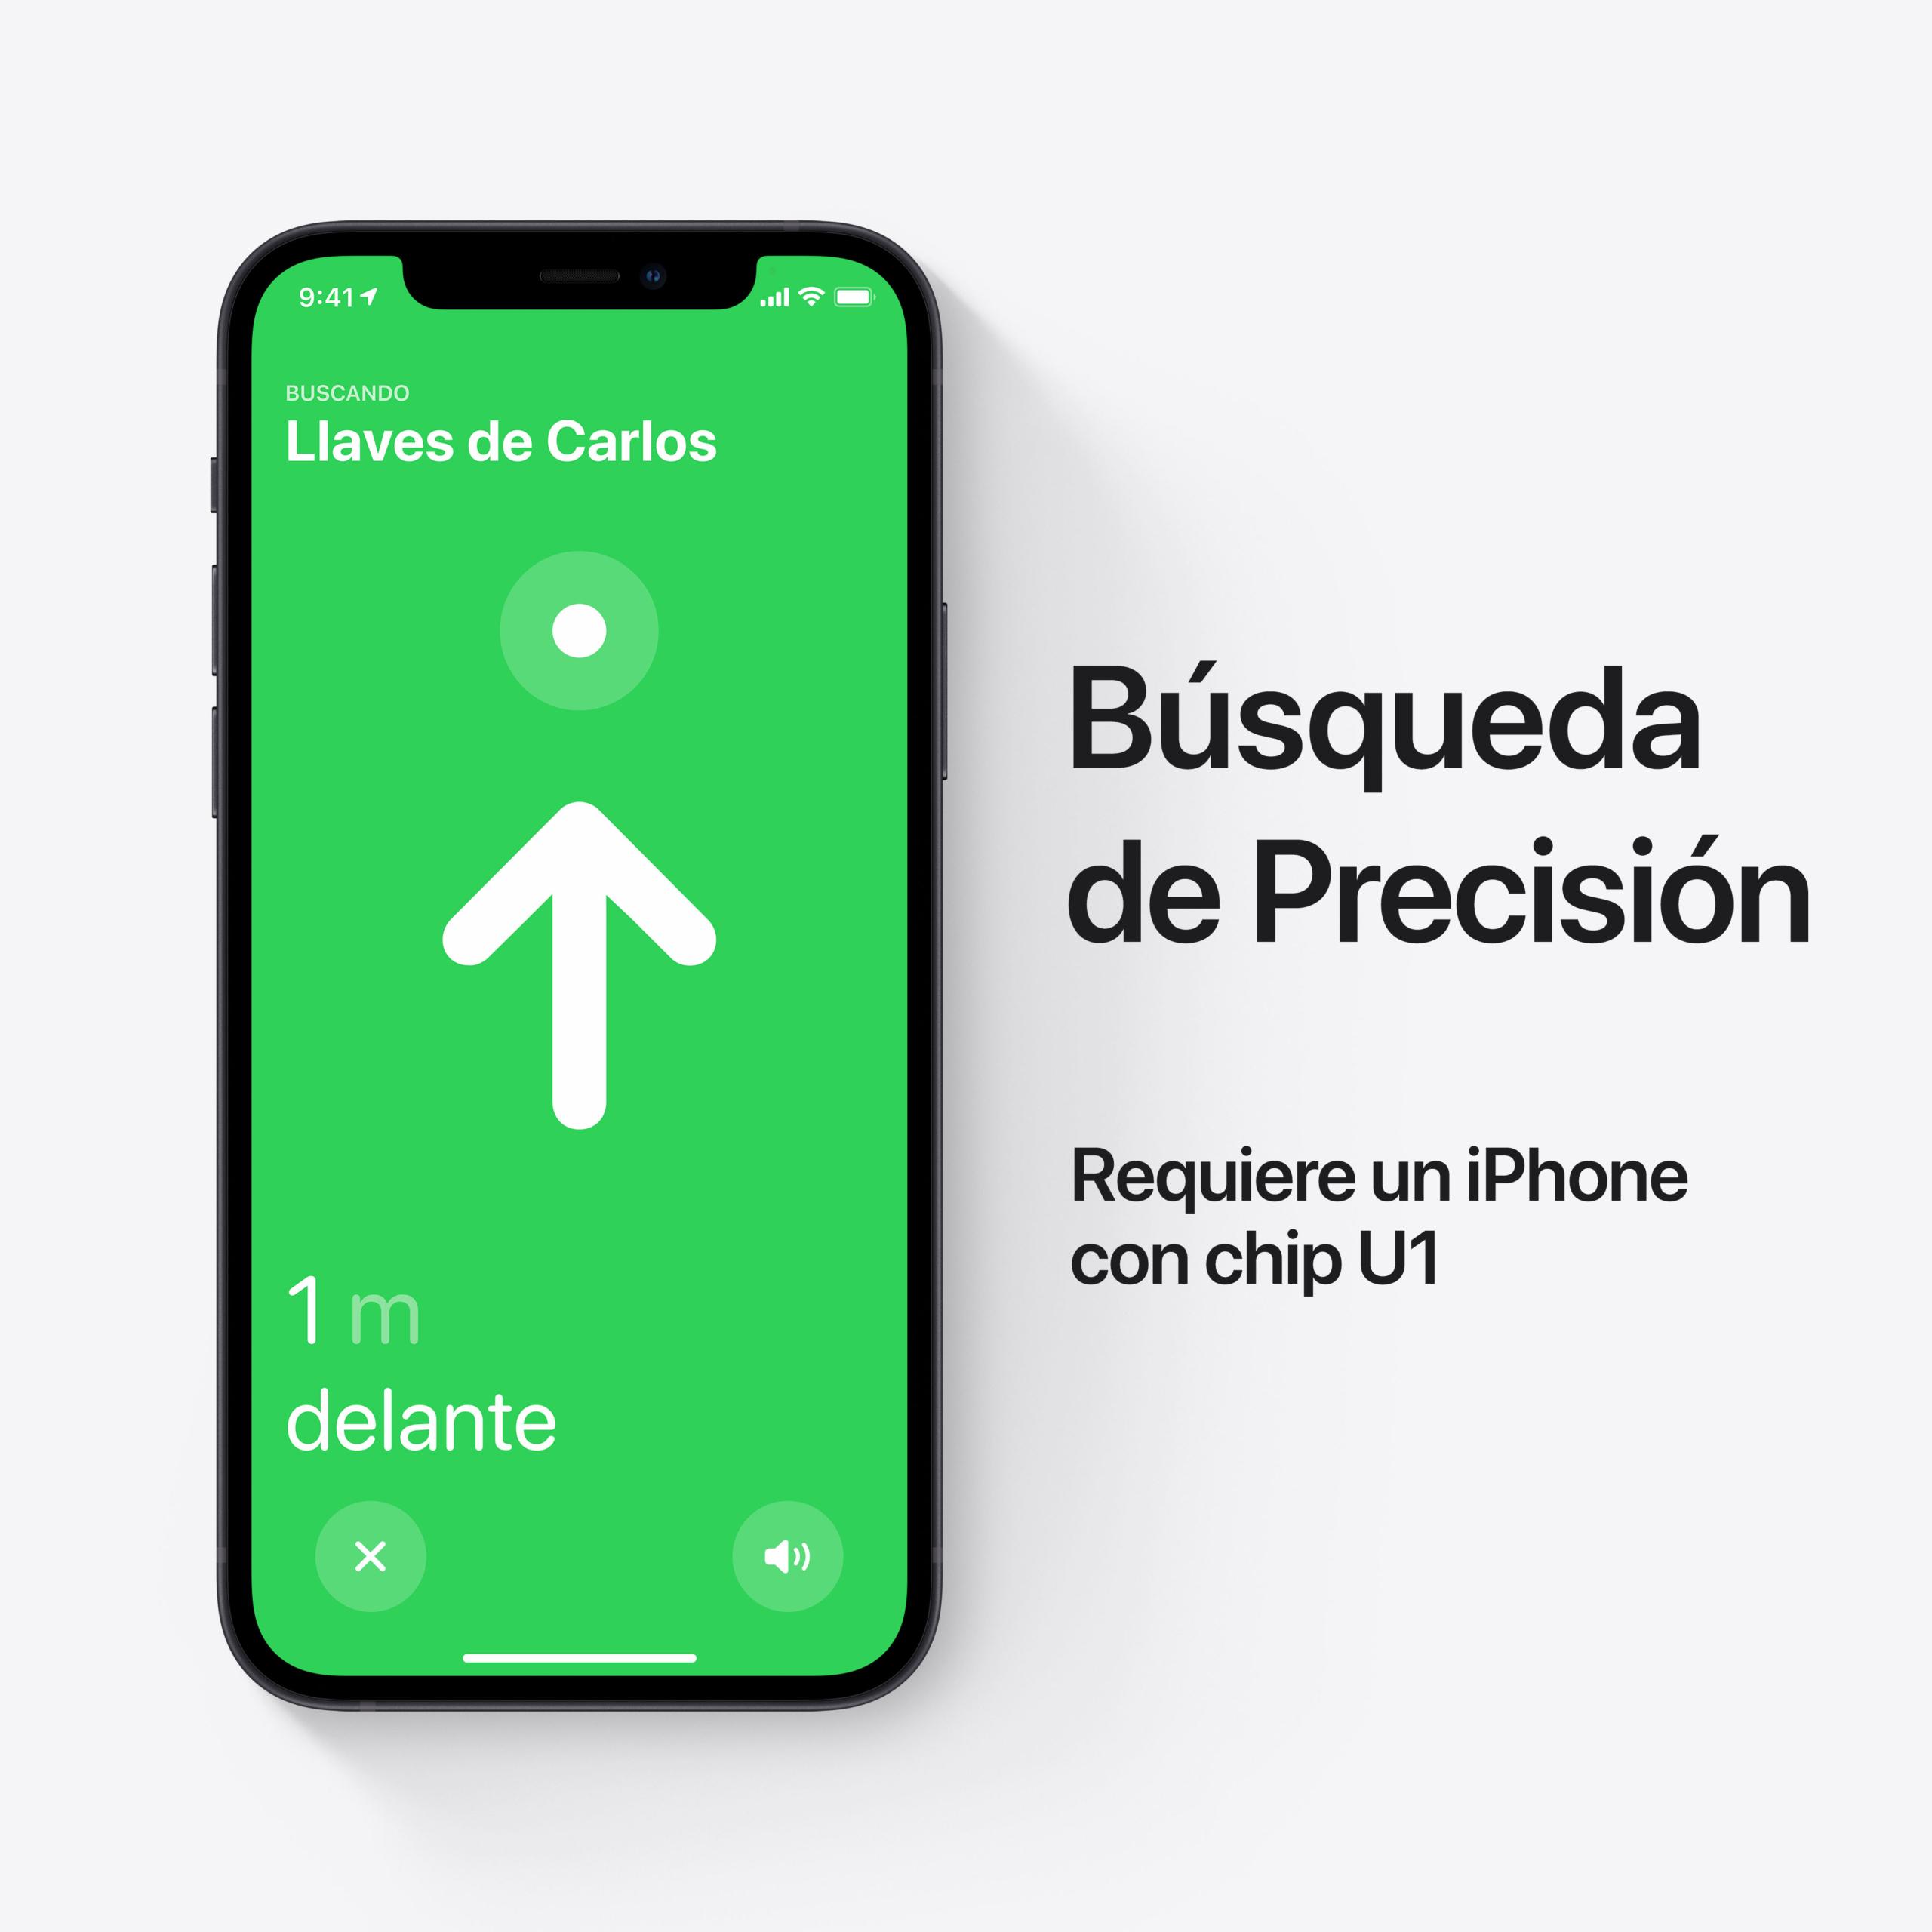 BUSQUEDA DE PRECISION